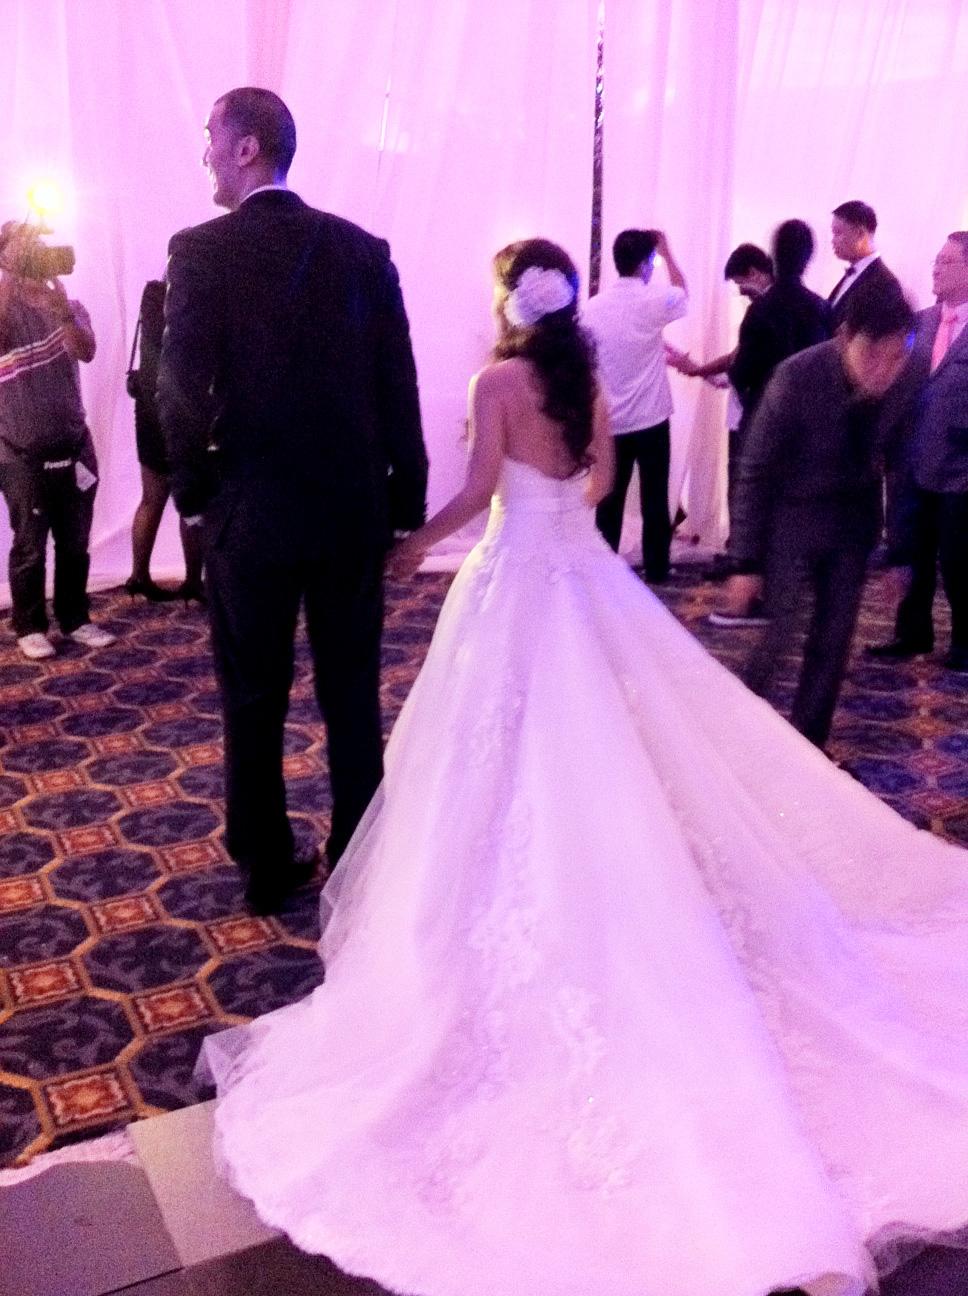 Rica\'s Diary: Ah, wedding.